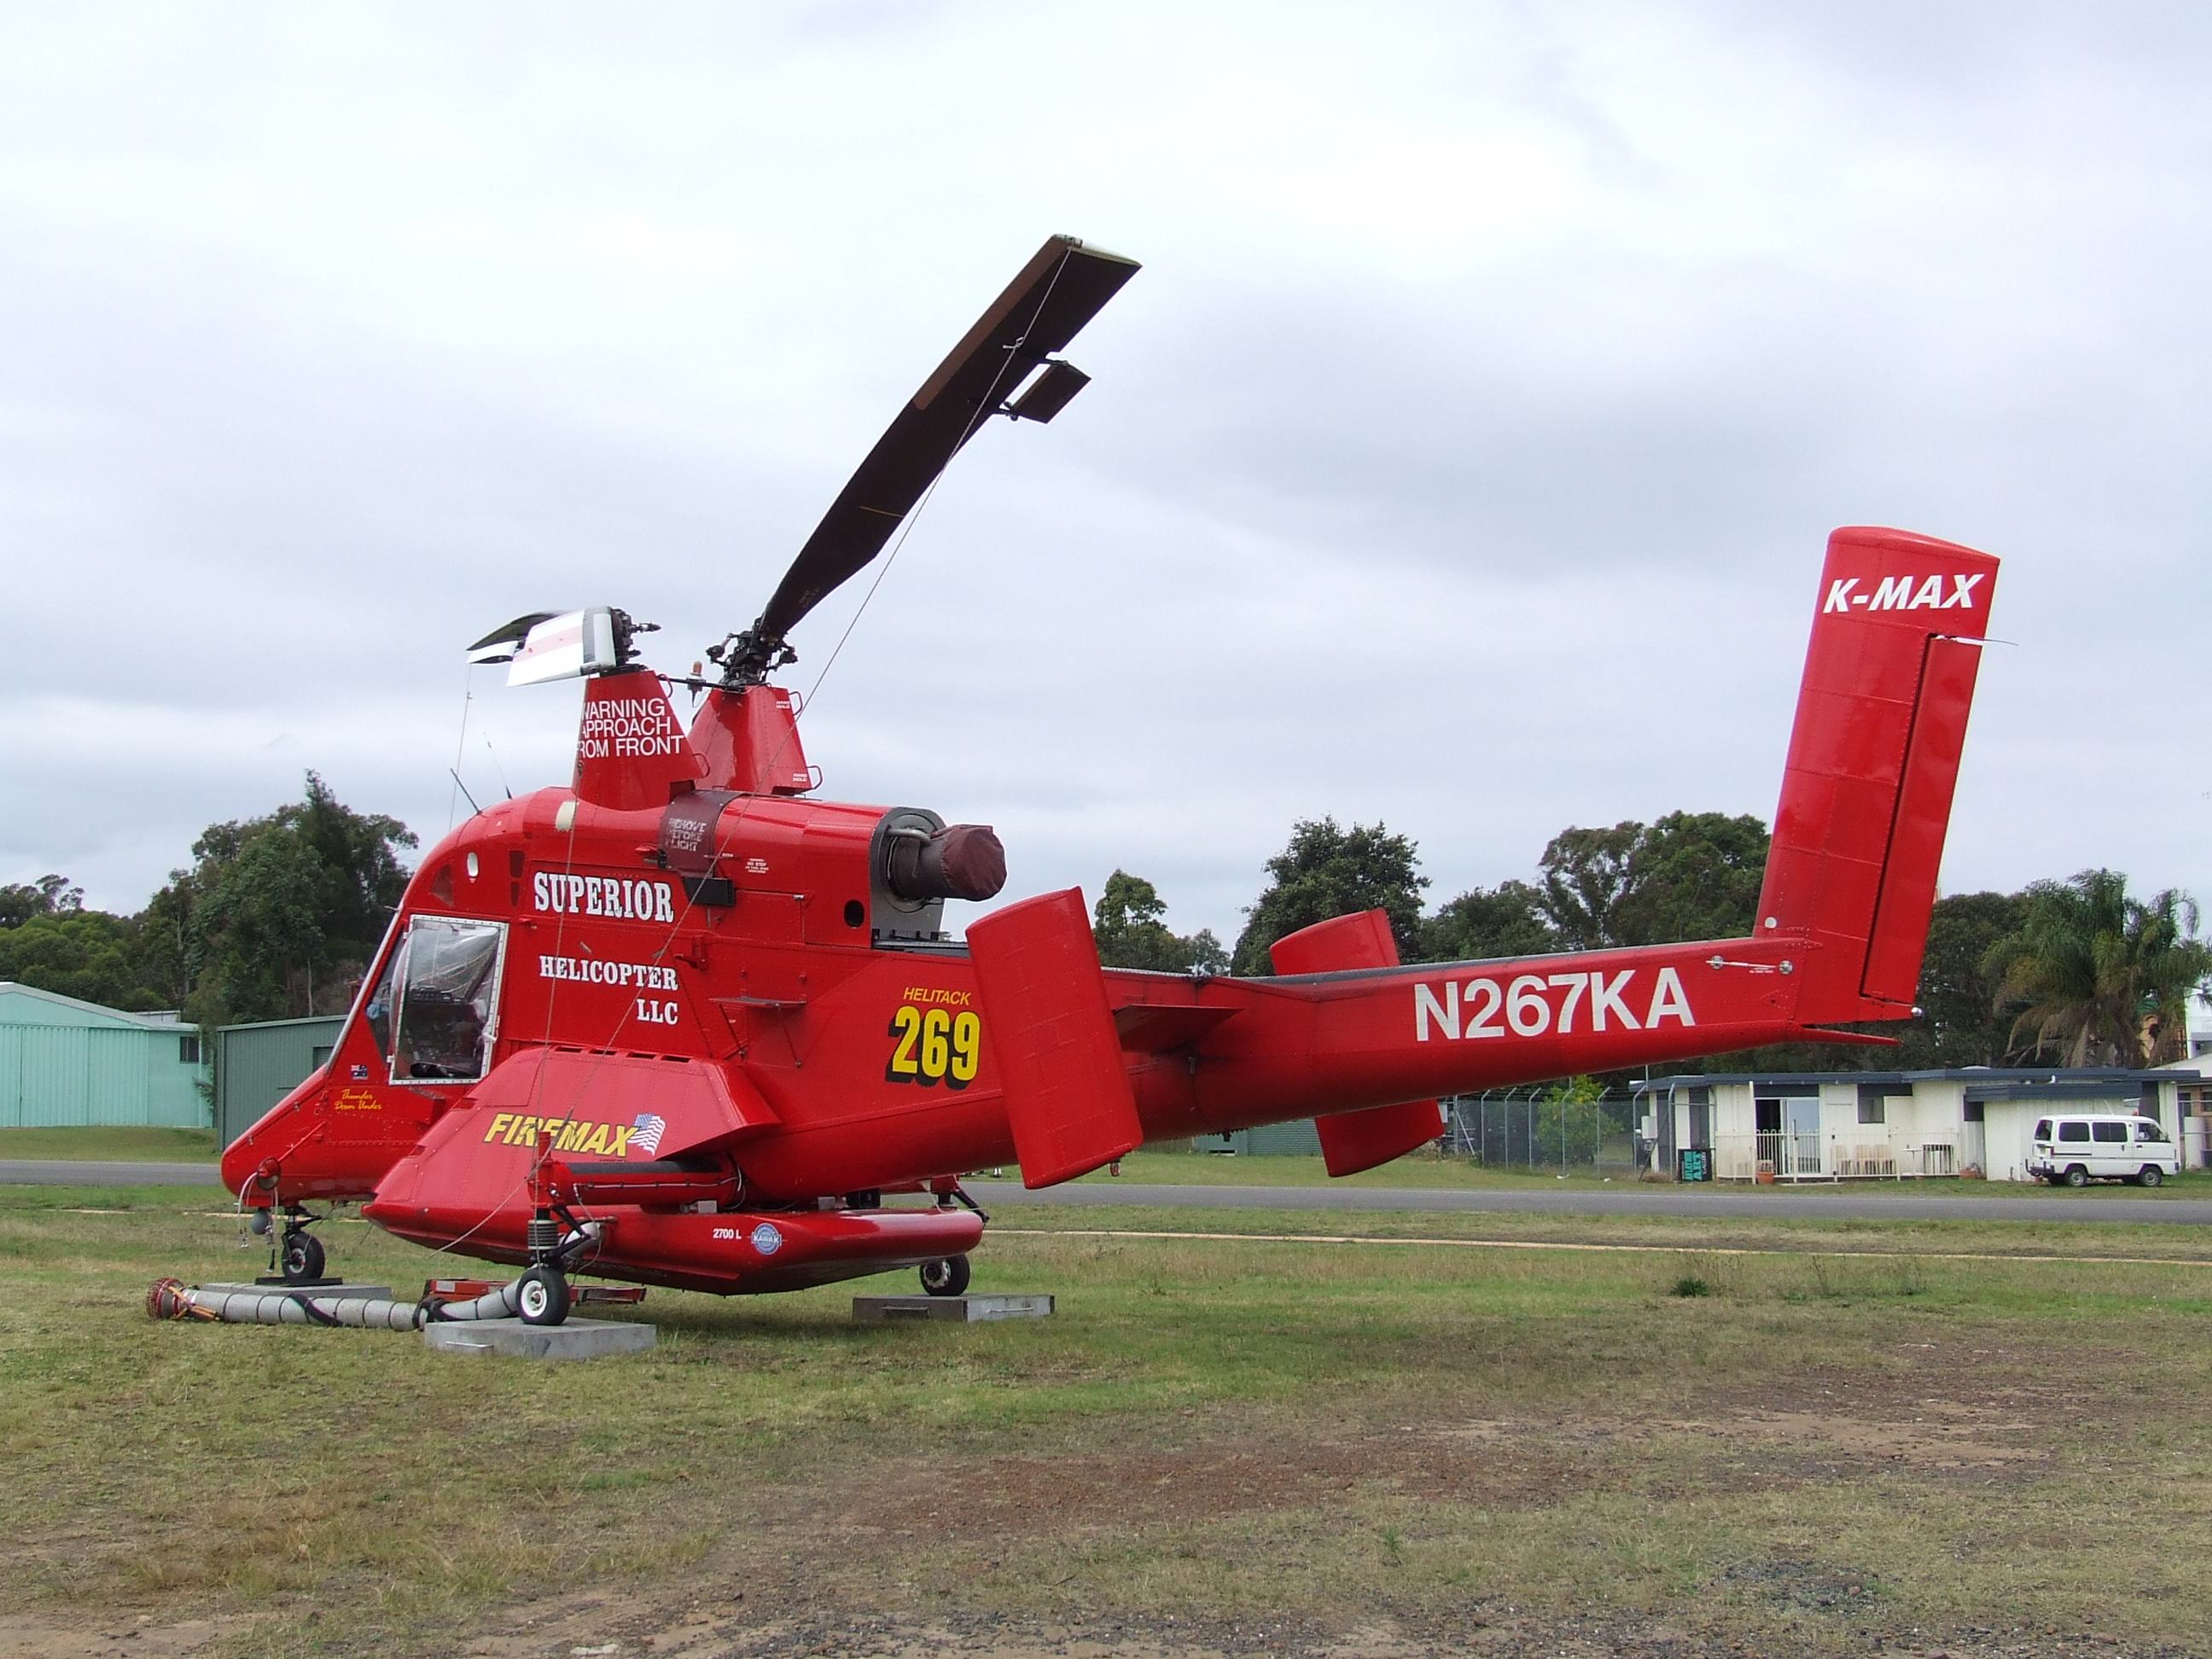 Elicottero Kaman K Max : 유용원의 군사세계 gt 상용기 사진자료실